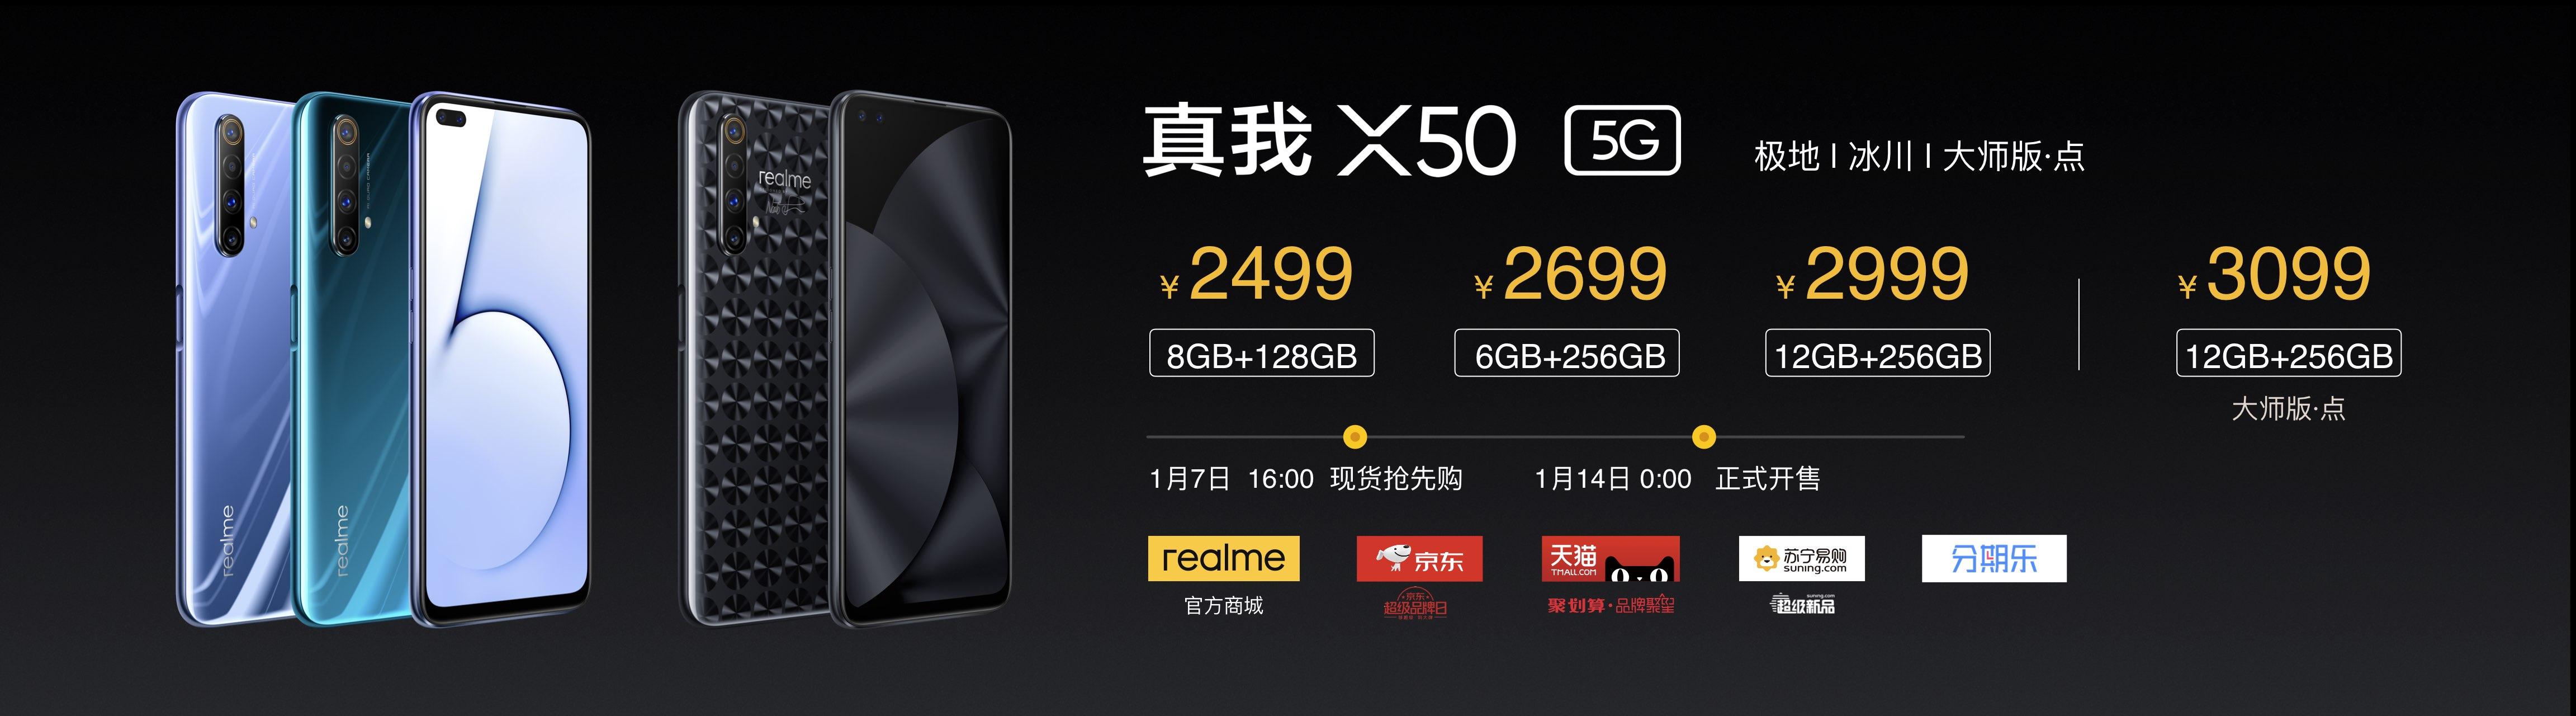 realme首款5G手机X50正式发布:搭载骁龙765G,2499元起售